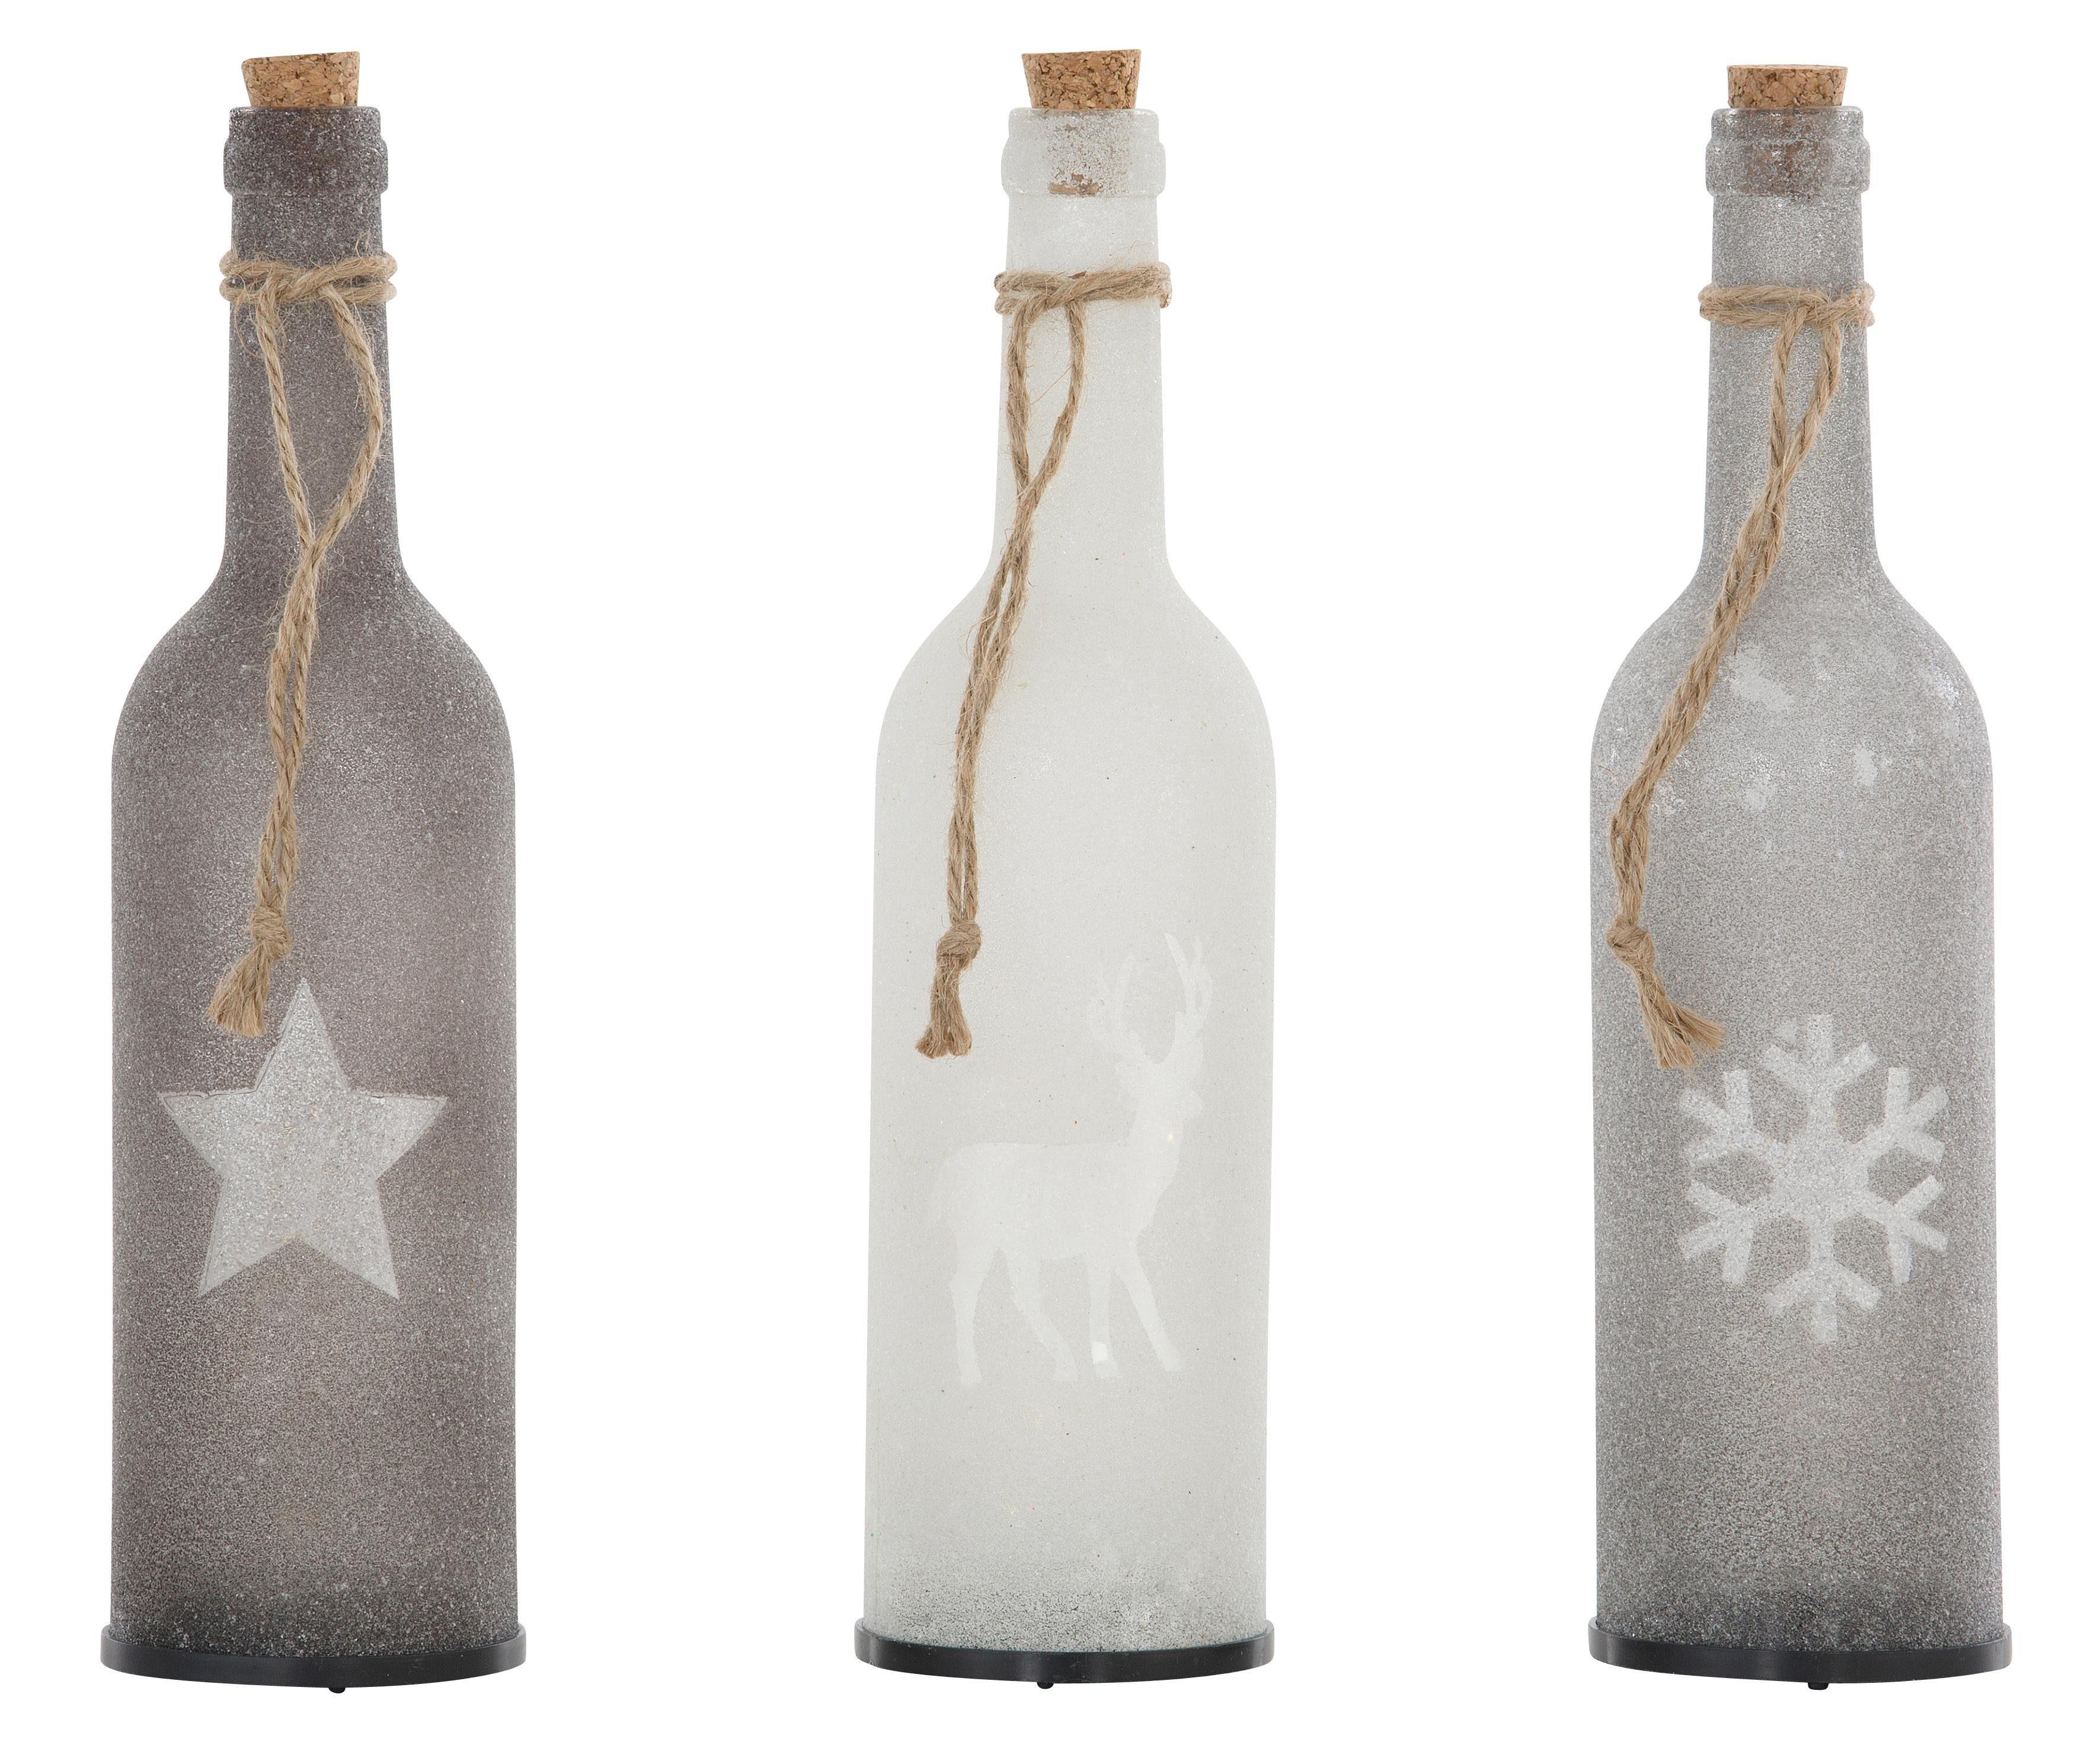 LED Deko-Glasflaschen, 3-teilig